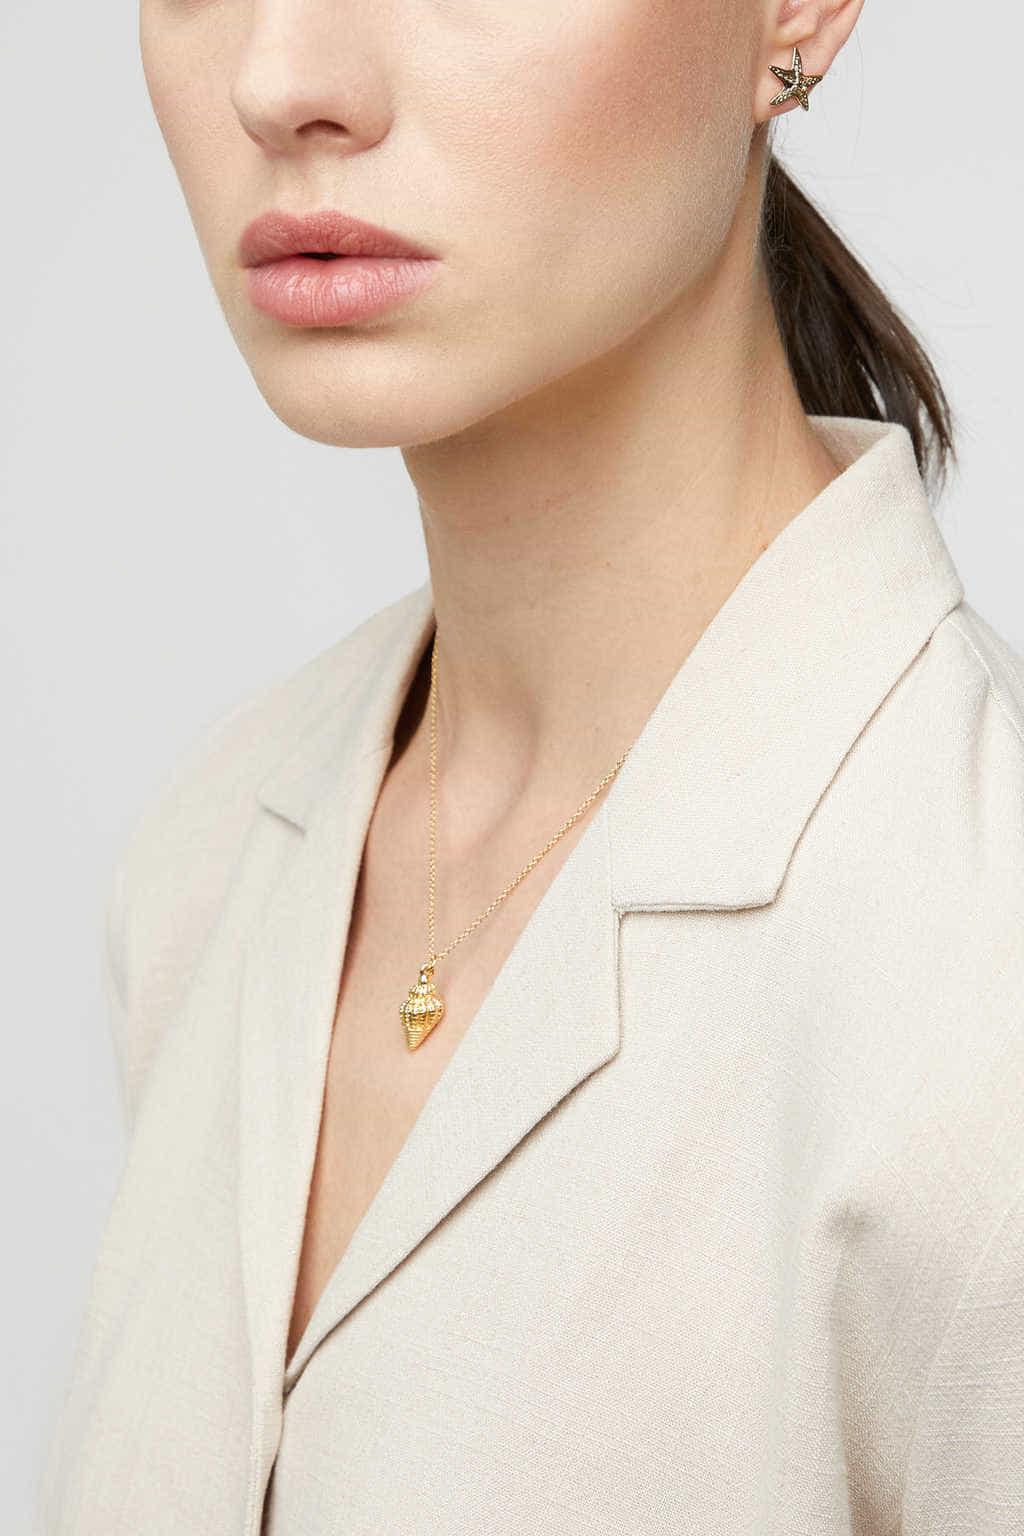 Necklace K007 Gold 1